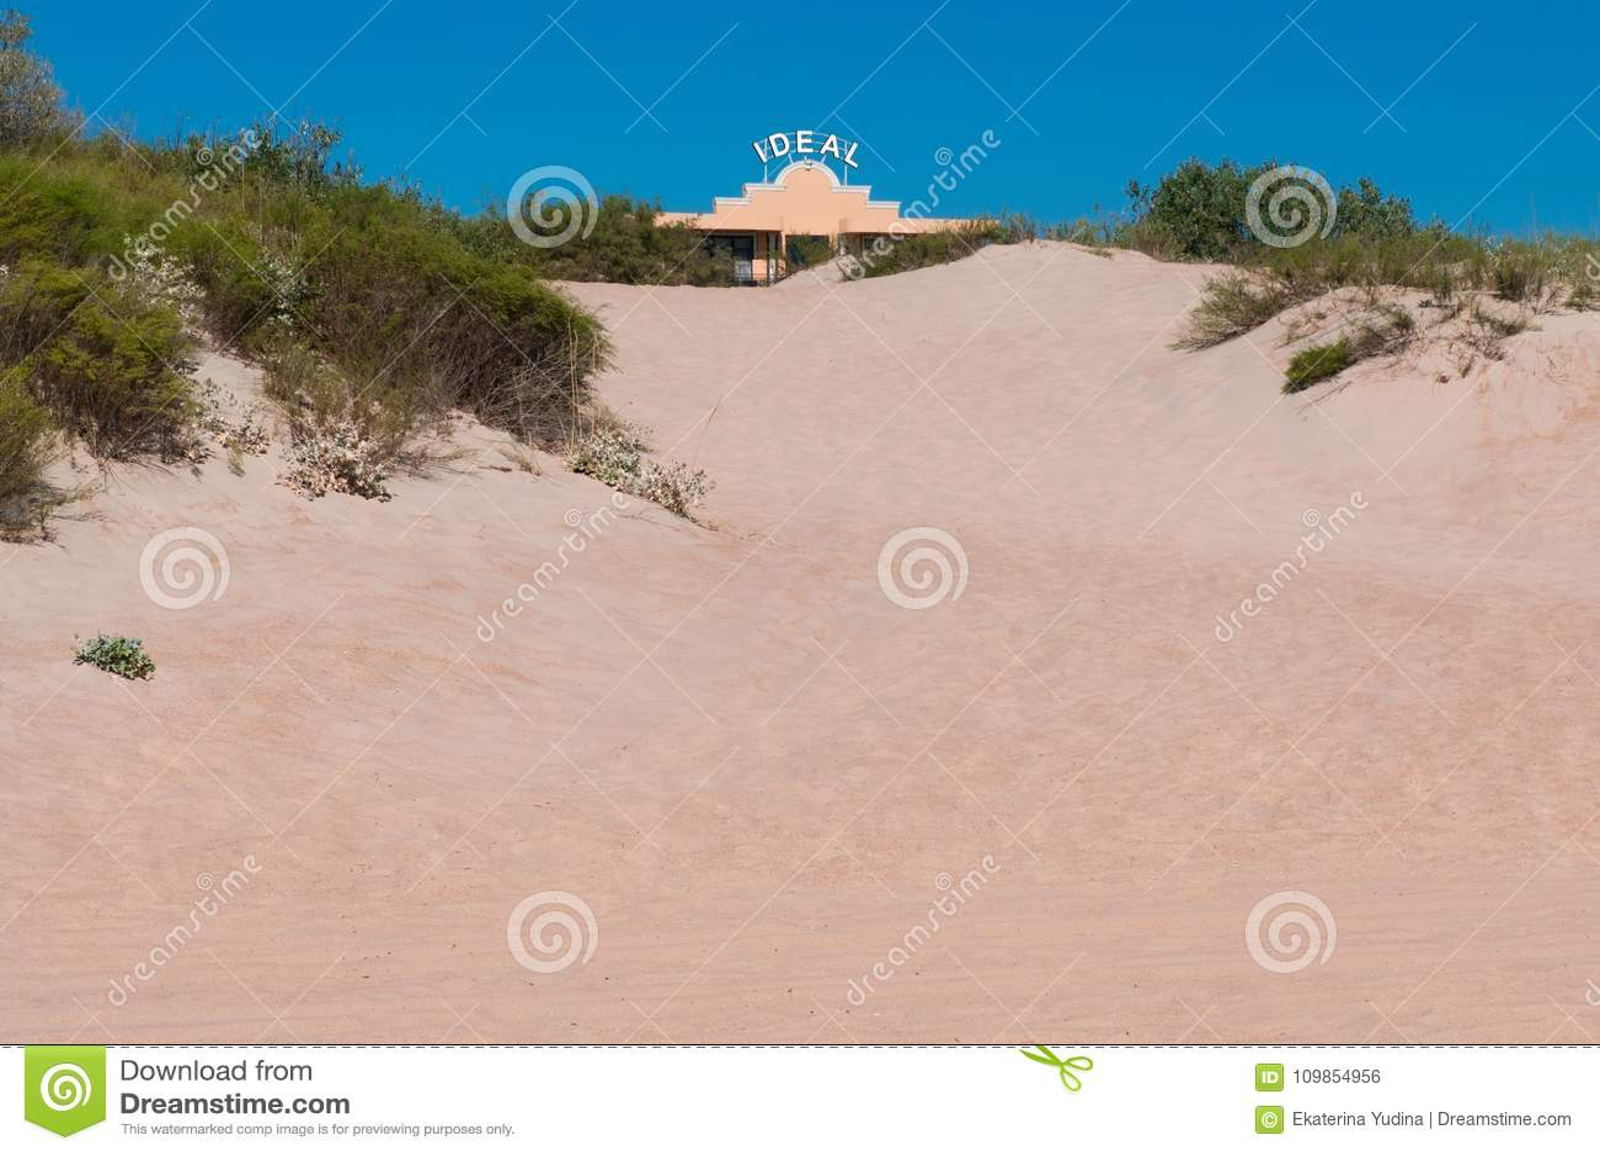 Дорога в песке